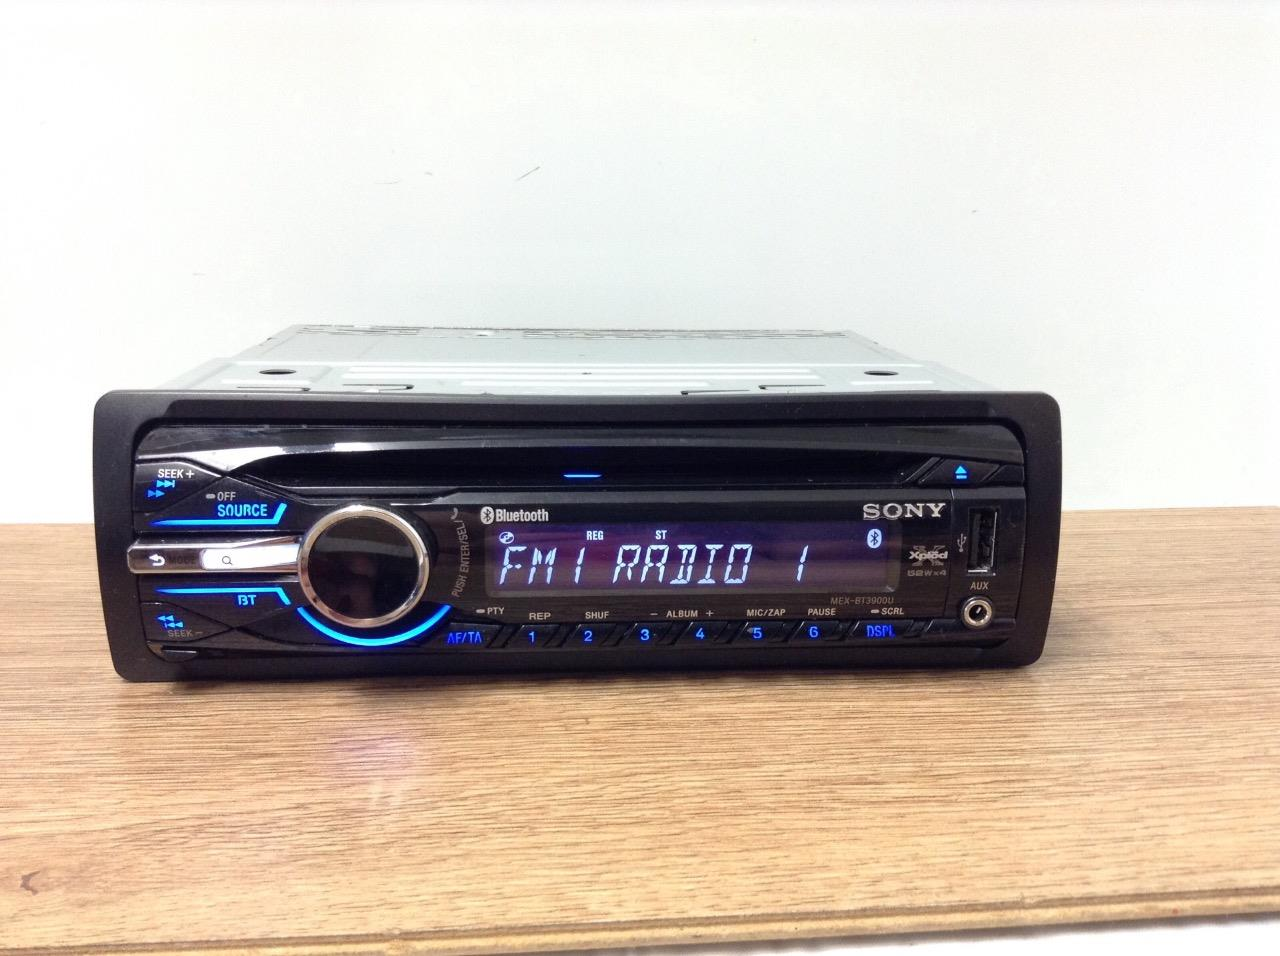 Sony Xplod Car Stereo With Bluetooth